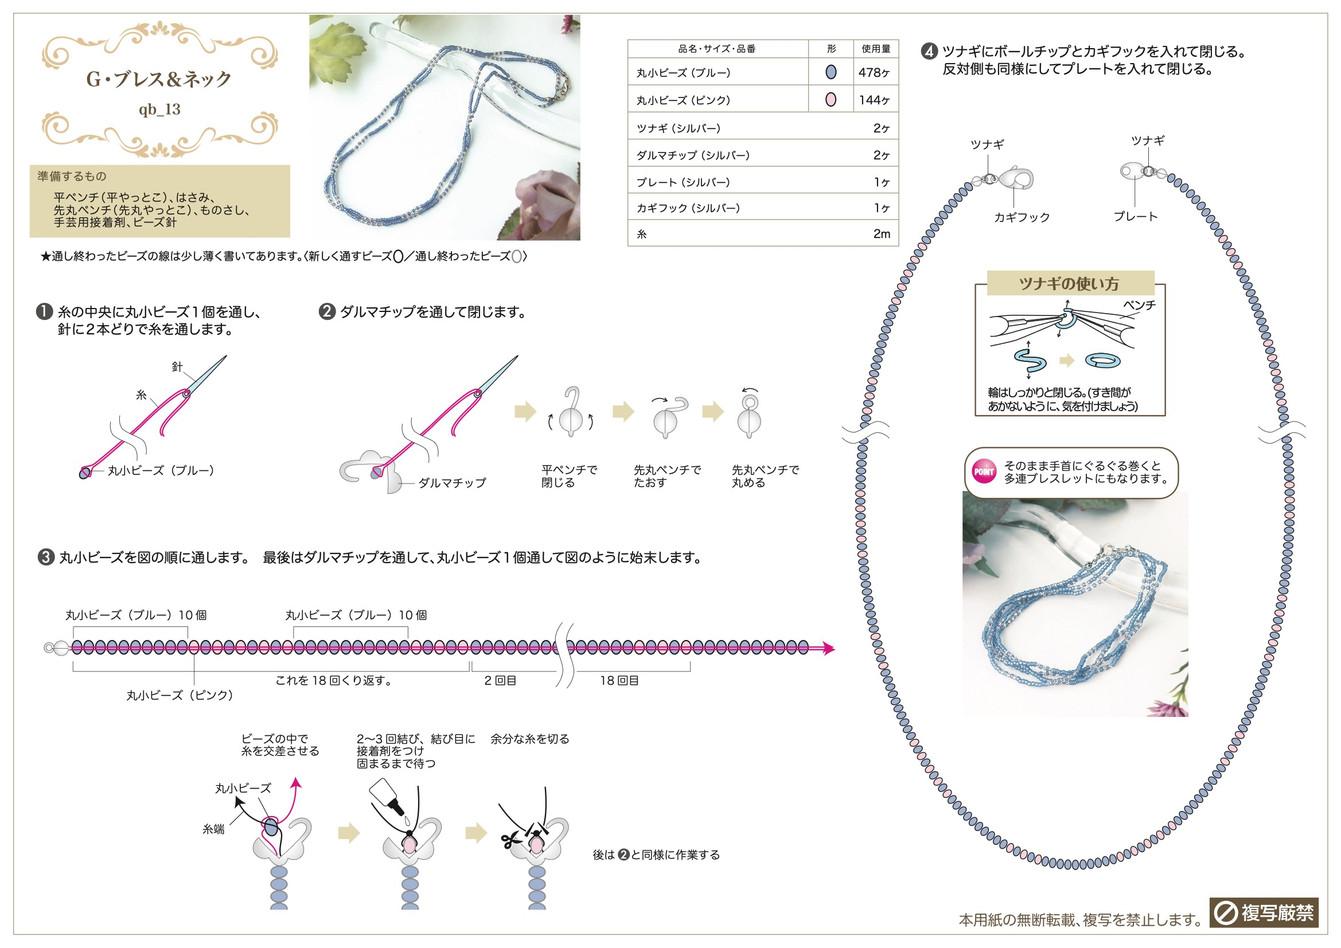 qb_13_rcp_G-neck.jpeg